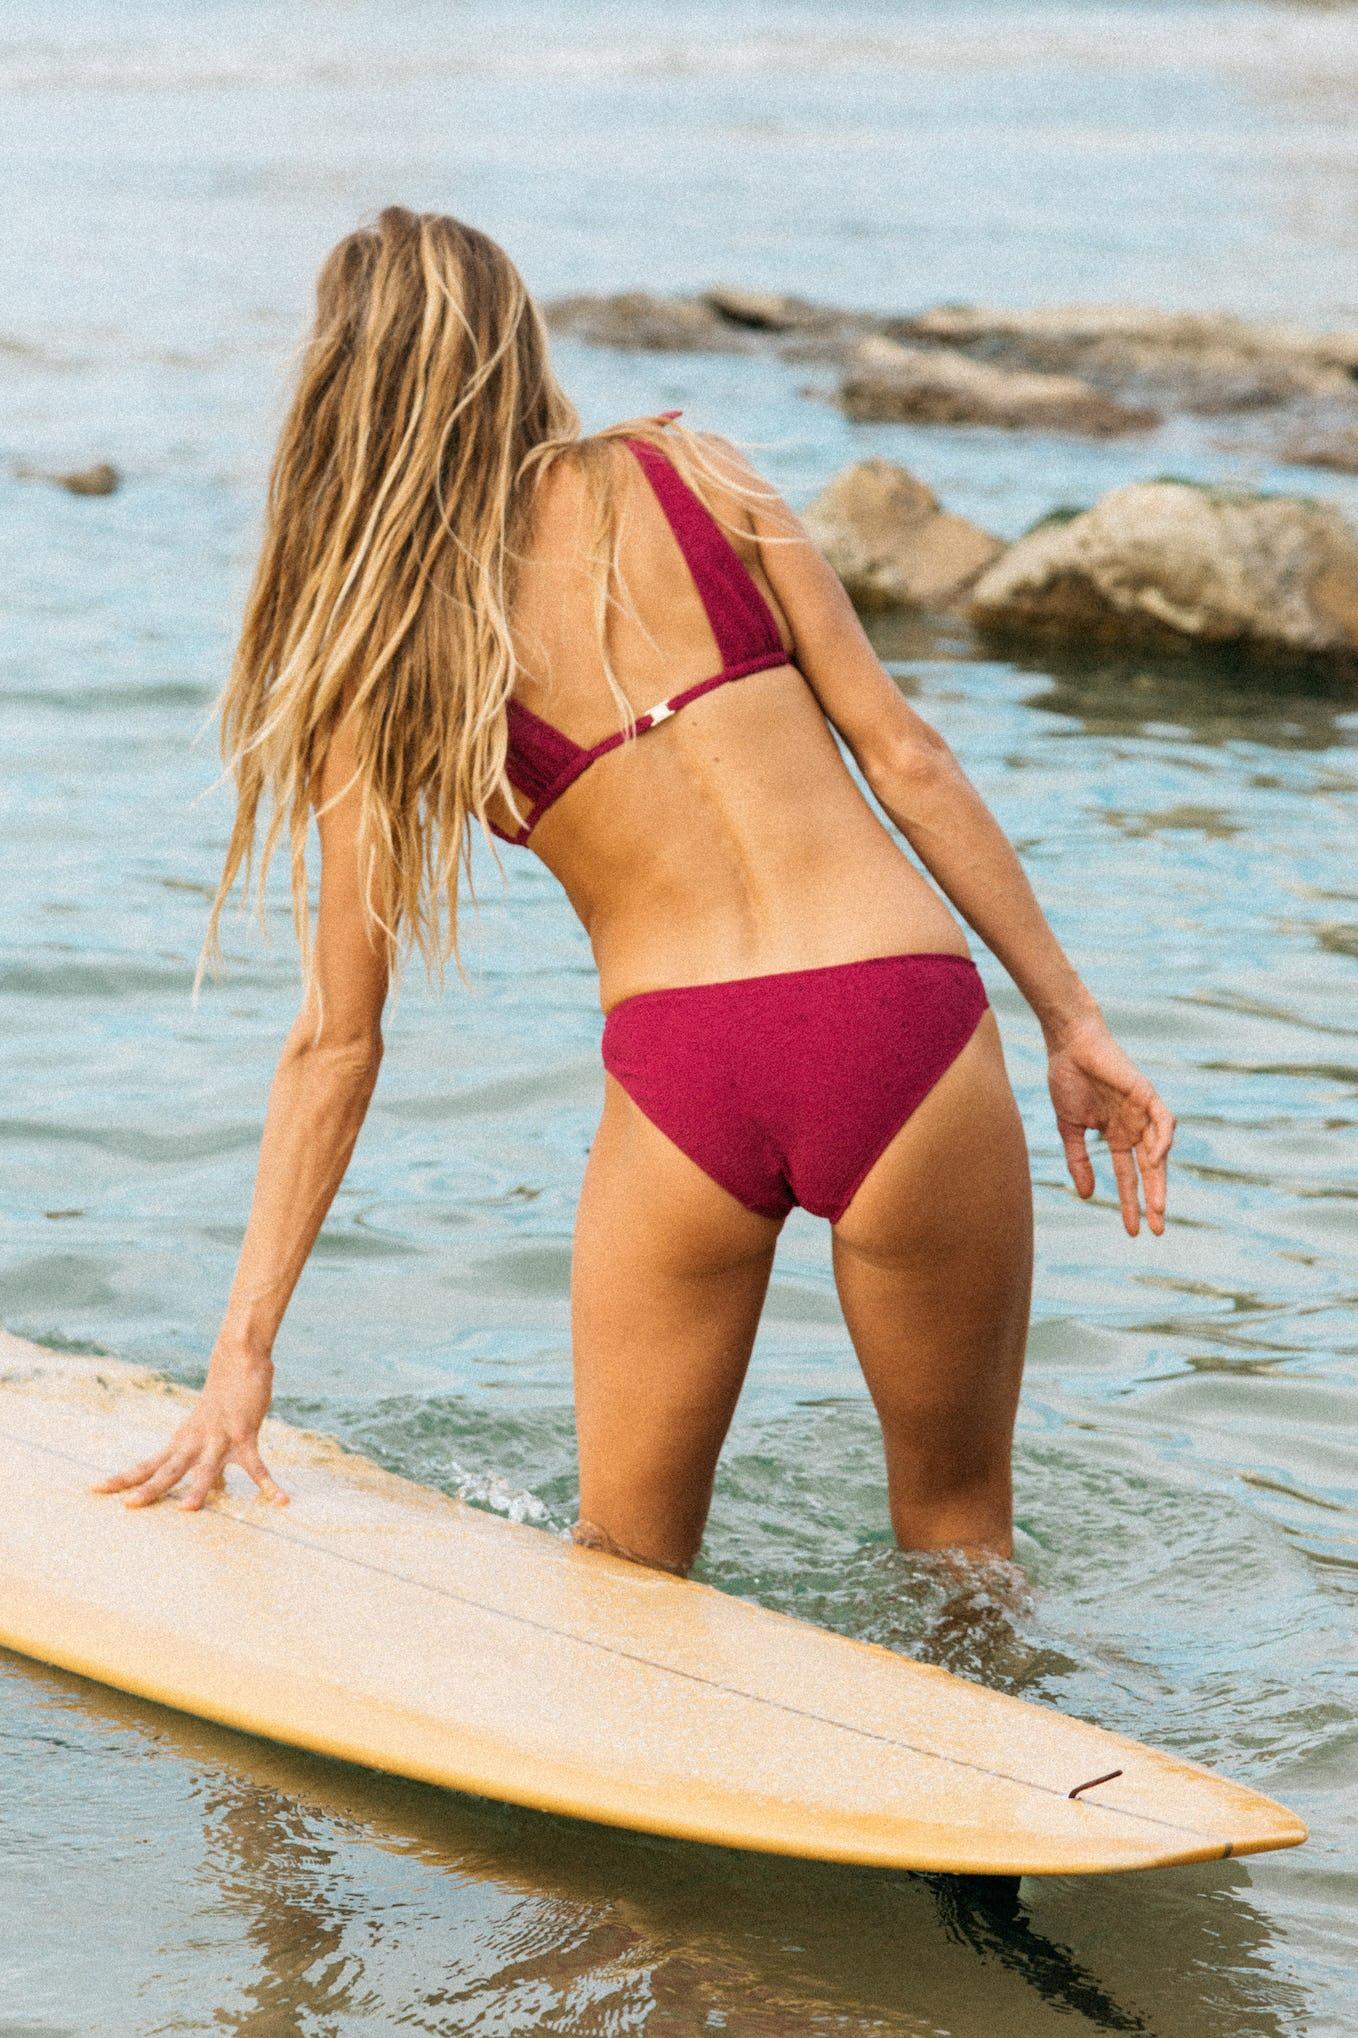 Bikini Sur le sable Fuschia